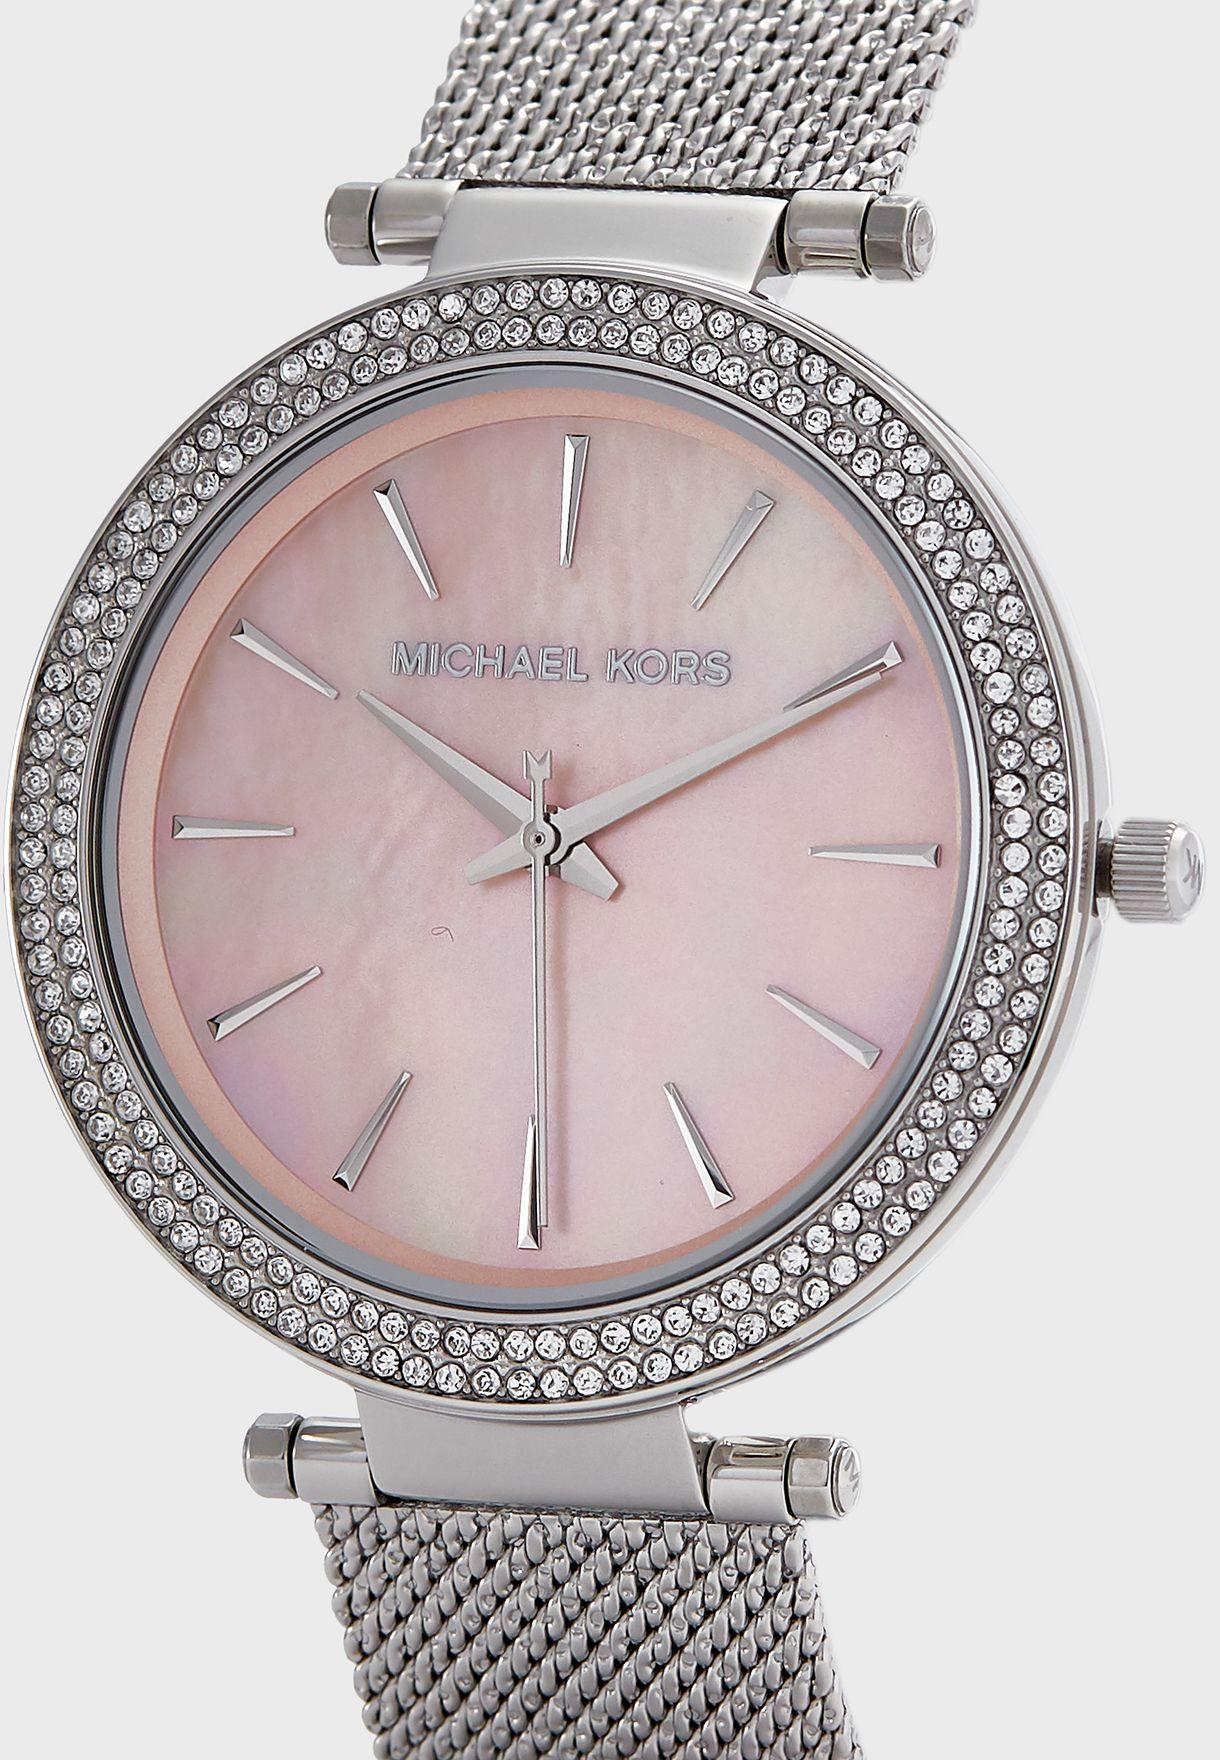 MK4518 Darci Analog Watch